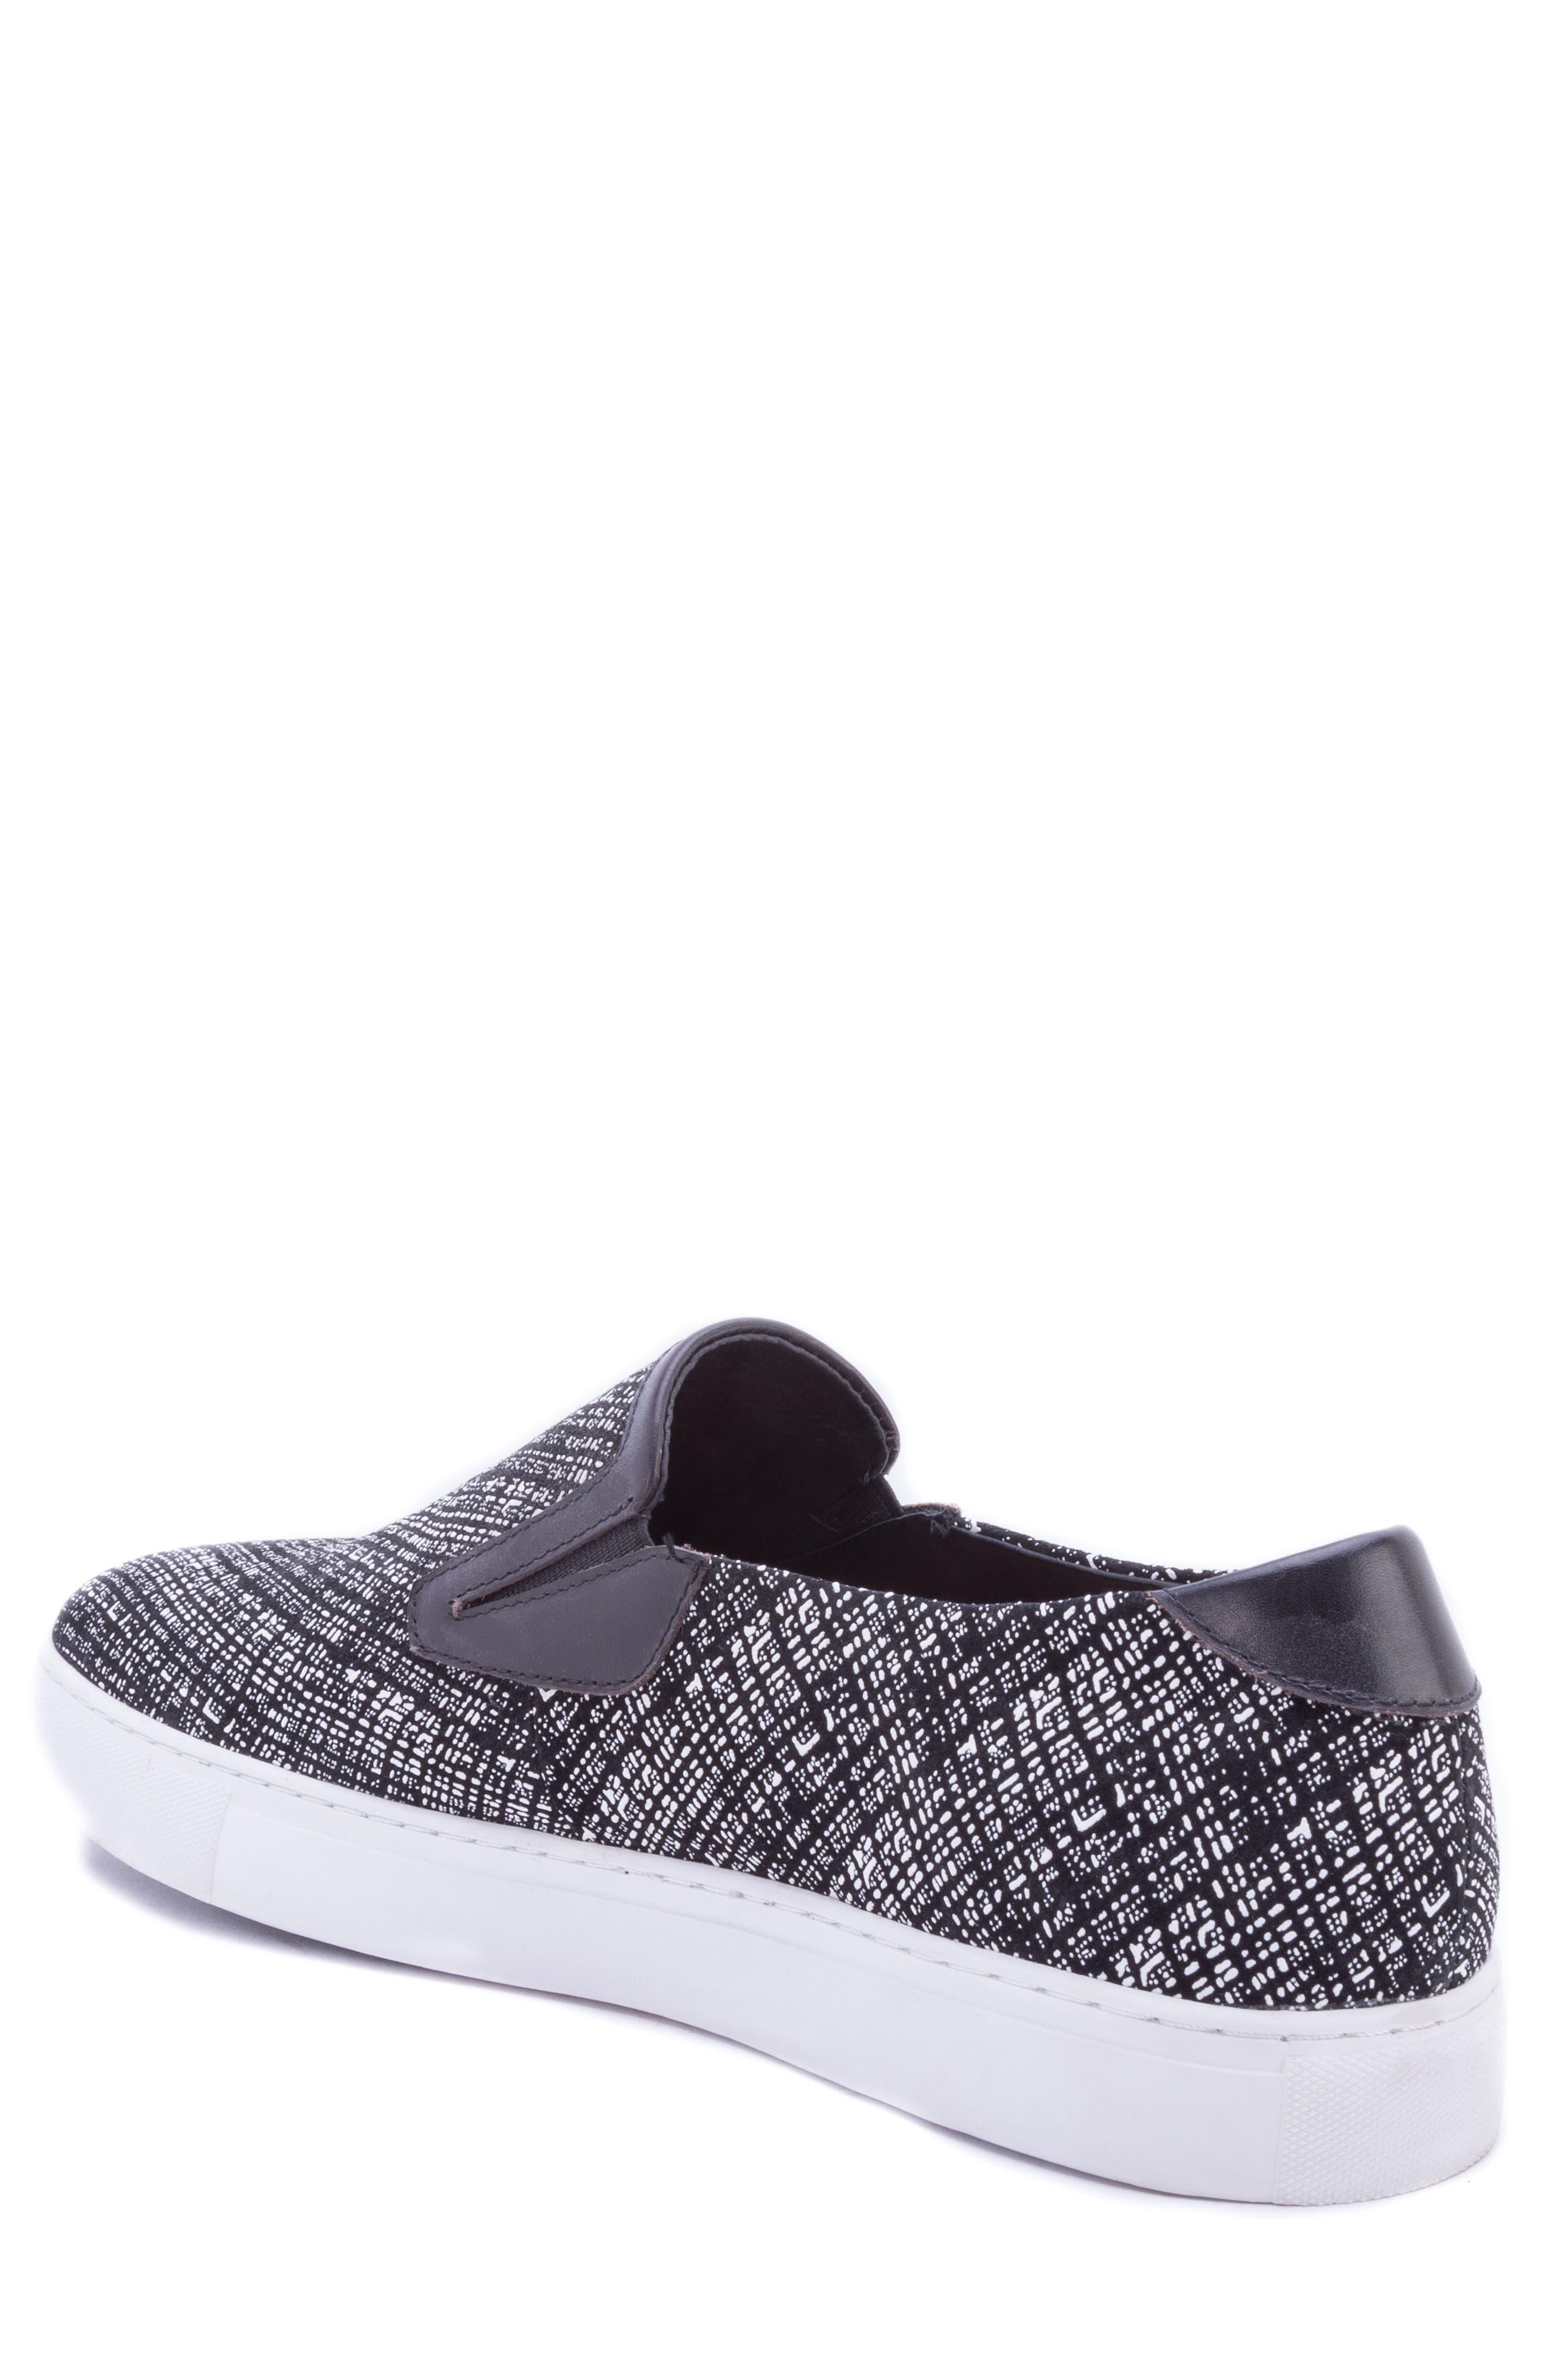 Kitson Slip-On Sneaker,                             Alternate thumbnail 2, color,                             BLACK SUEDE